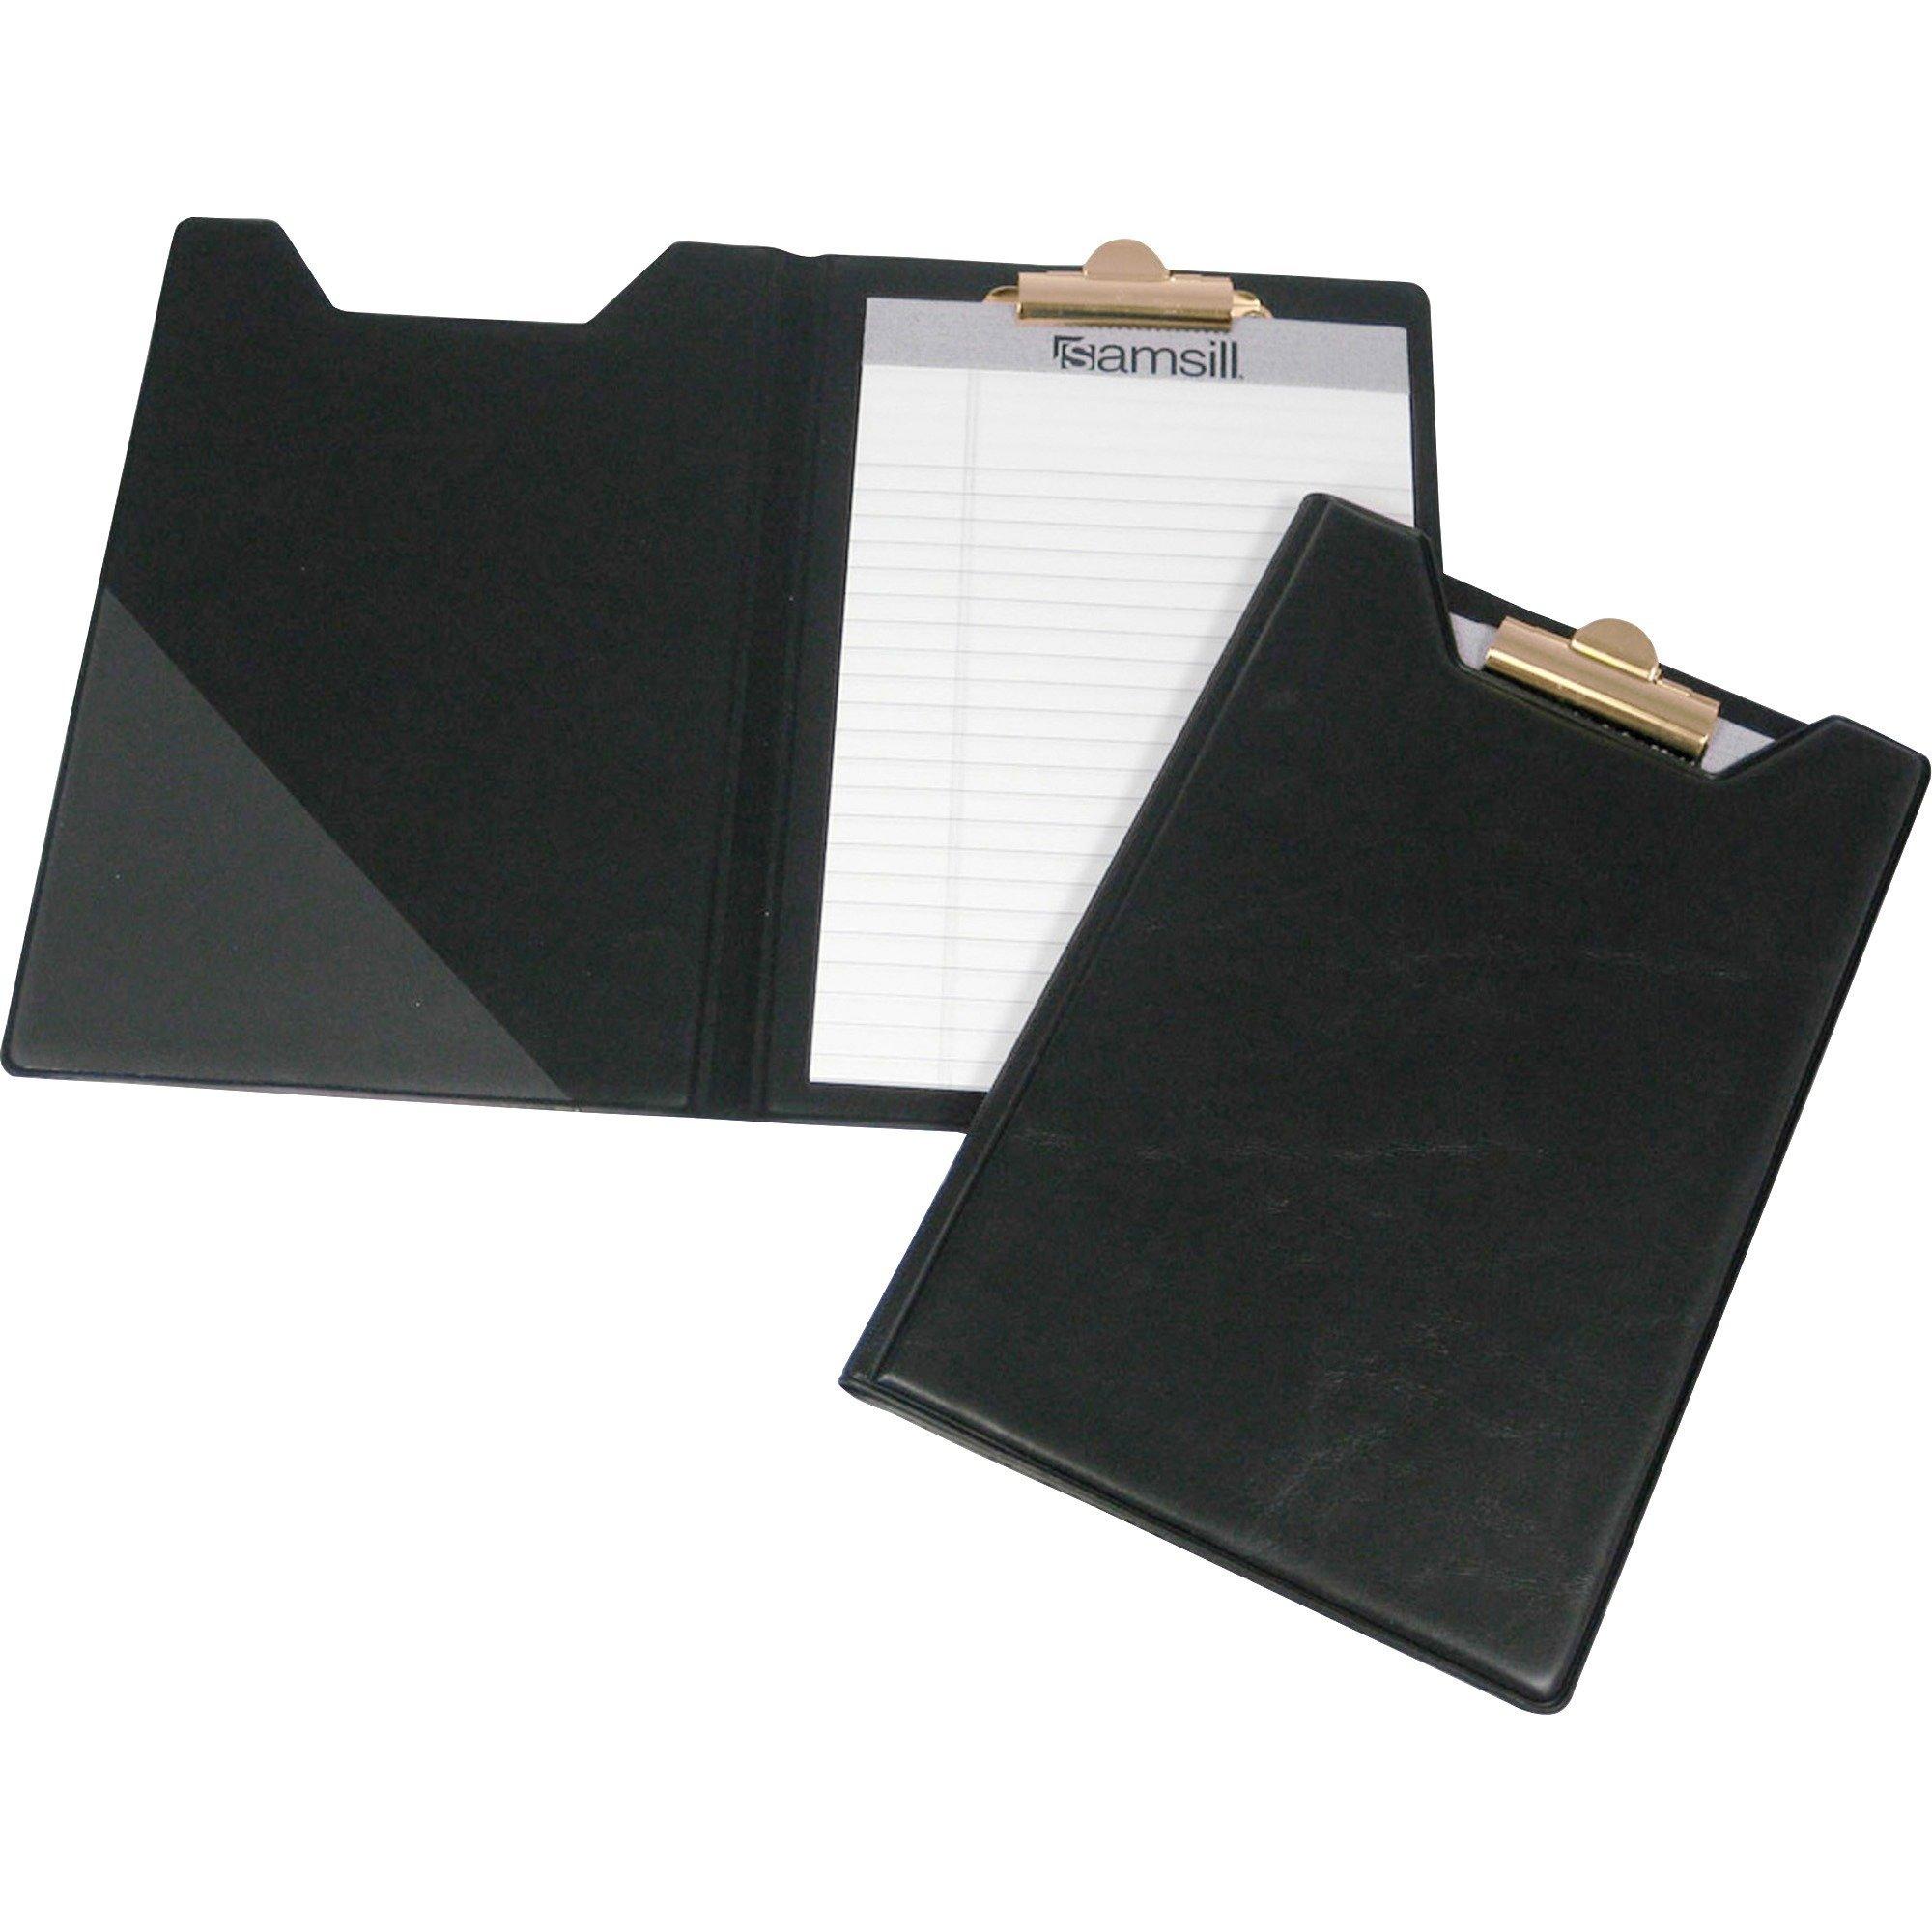 Samsill Clipboard Junior Padfolio/Portfolio, 5 x 8 Writing Pad, Black